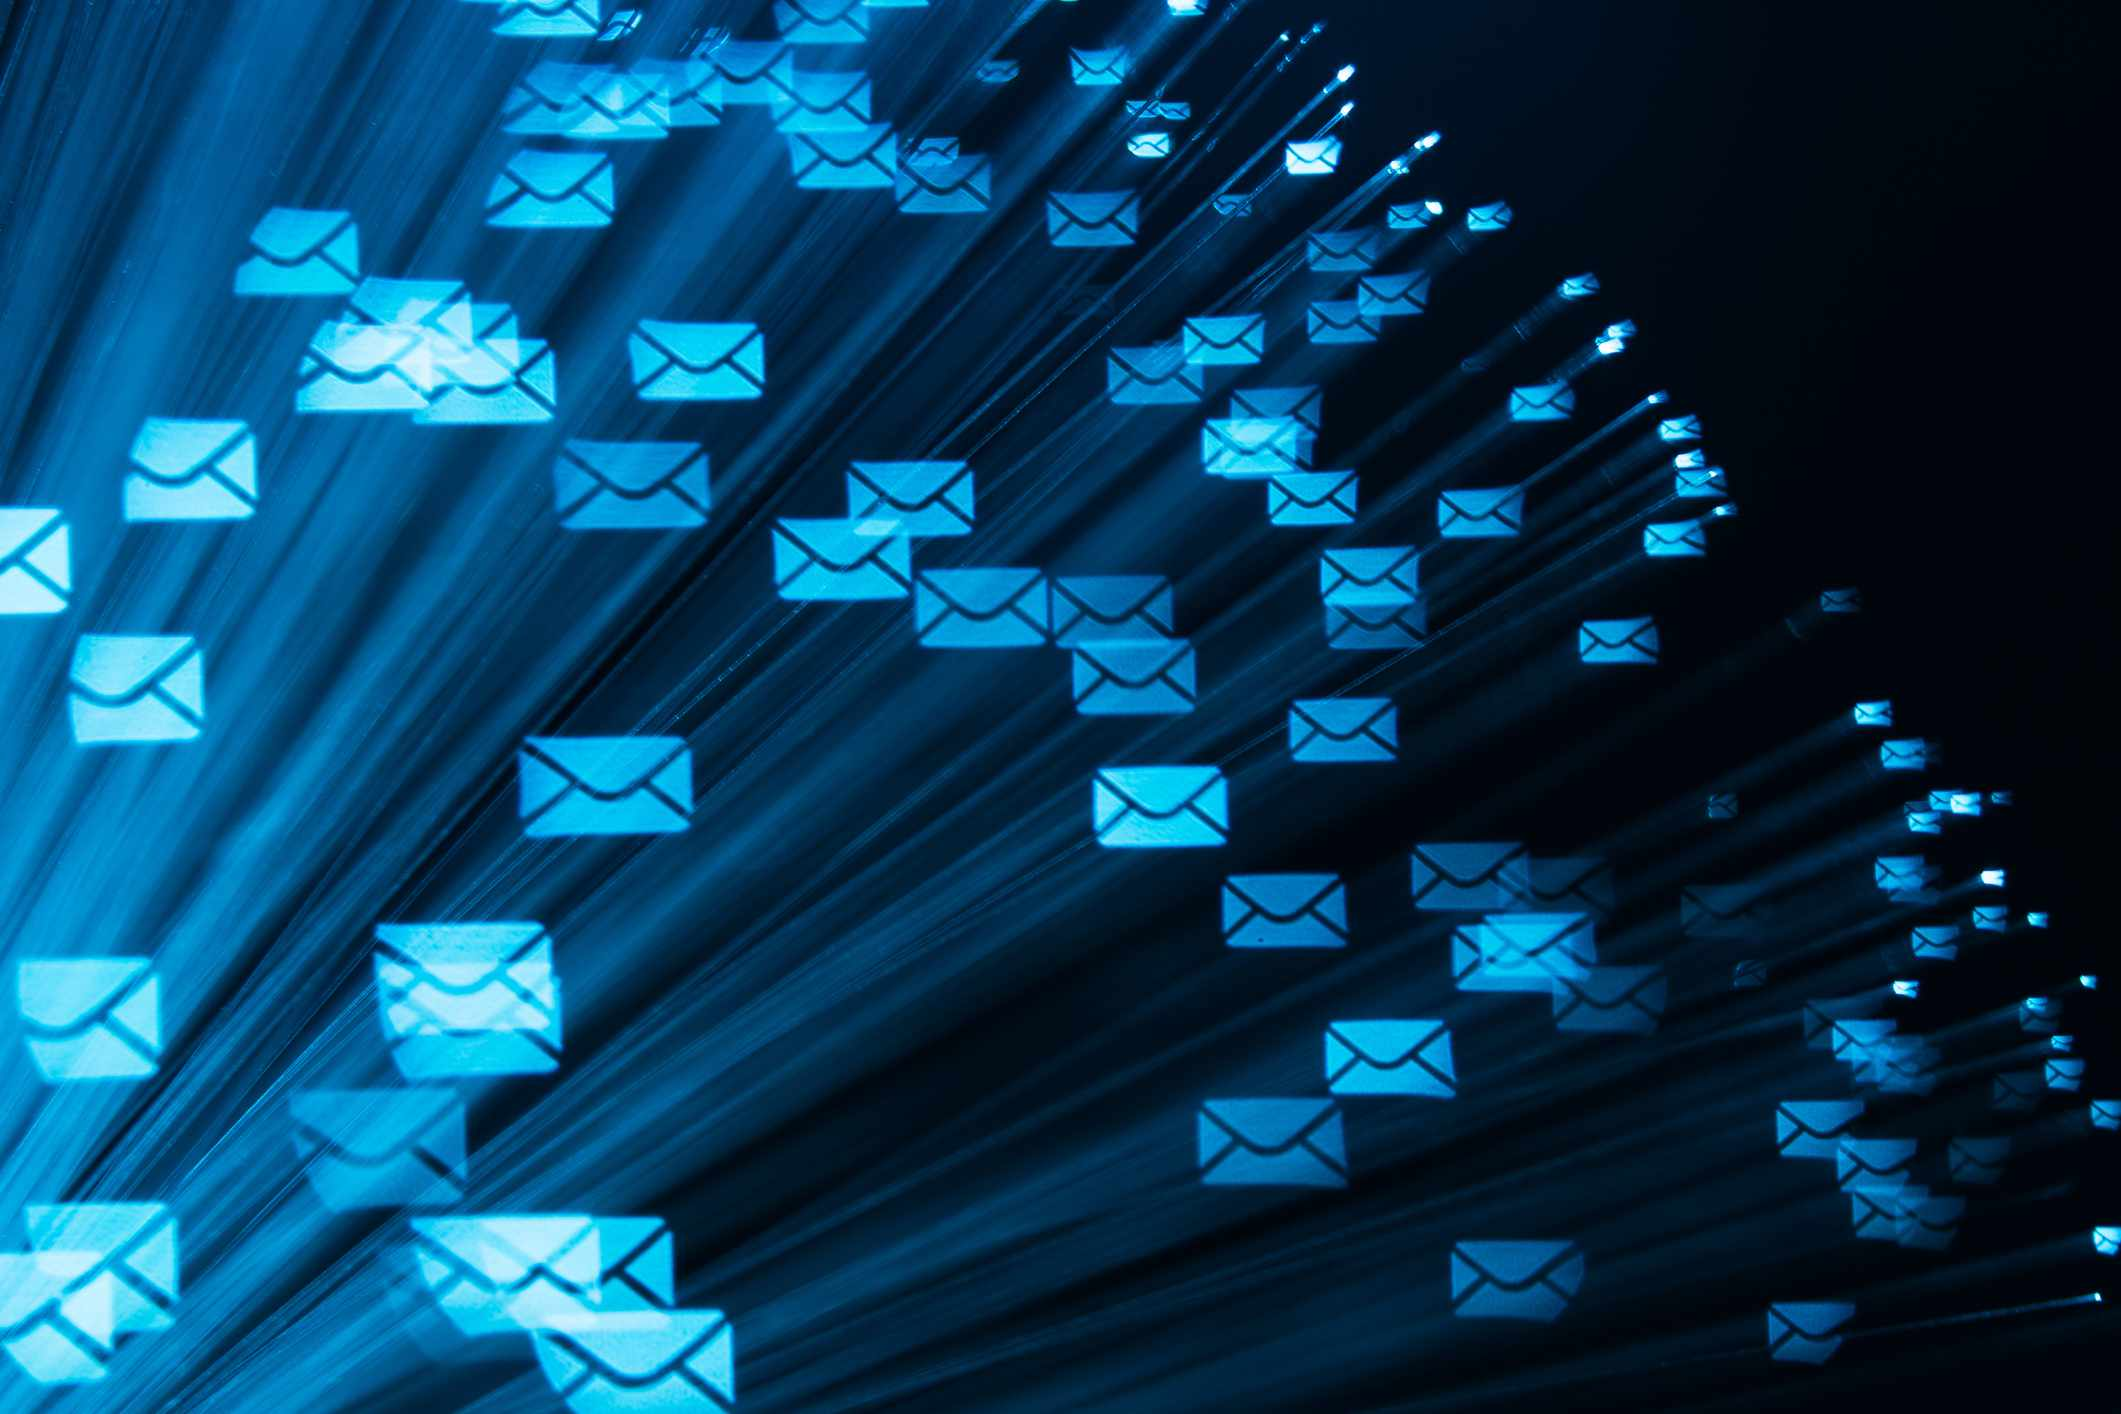 Network Communications Concept, Envelope Shaped Bokeh of Blue Light